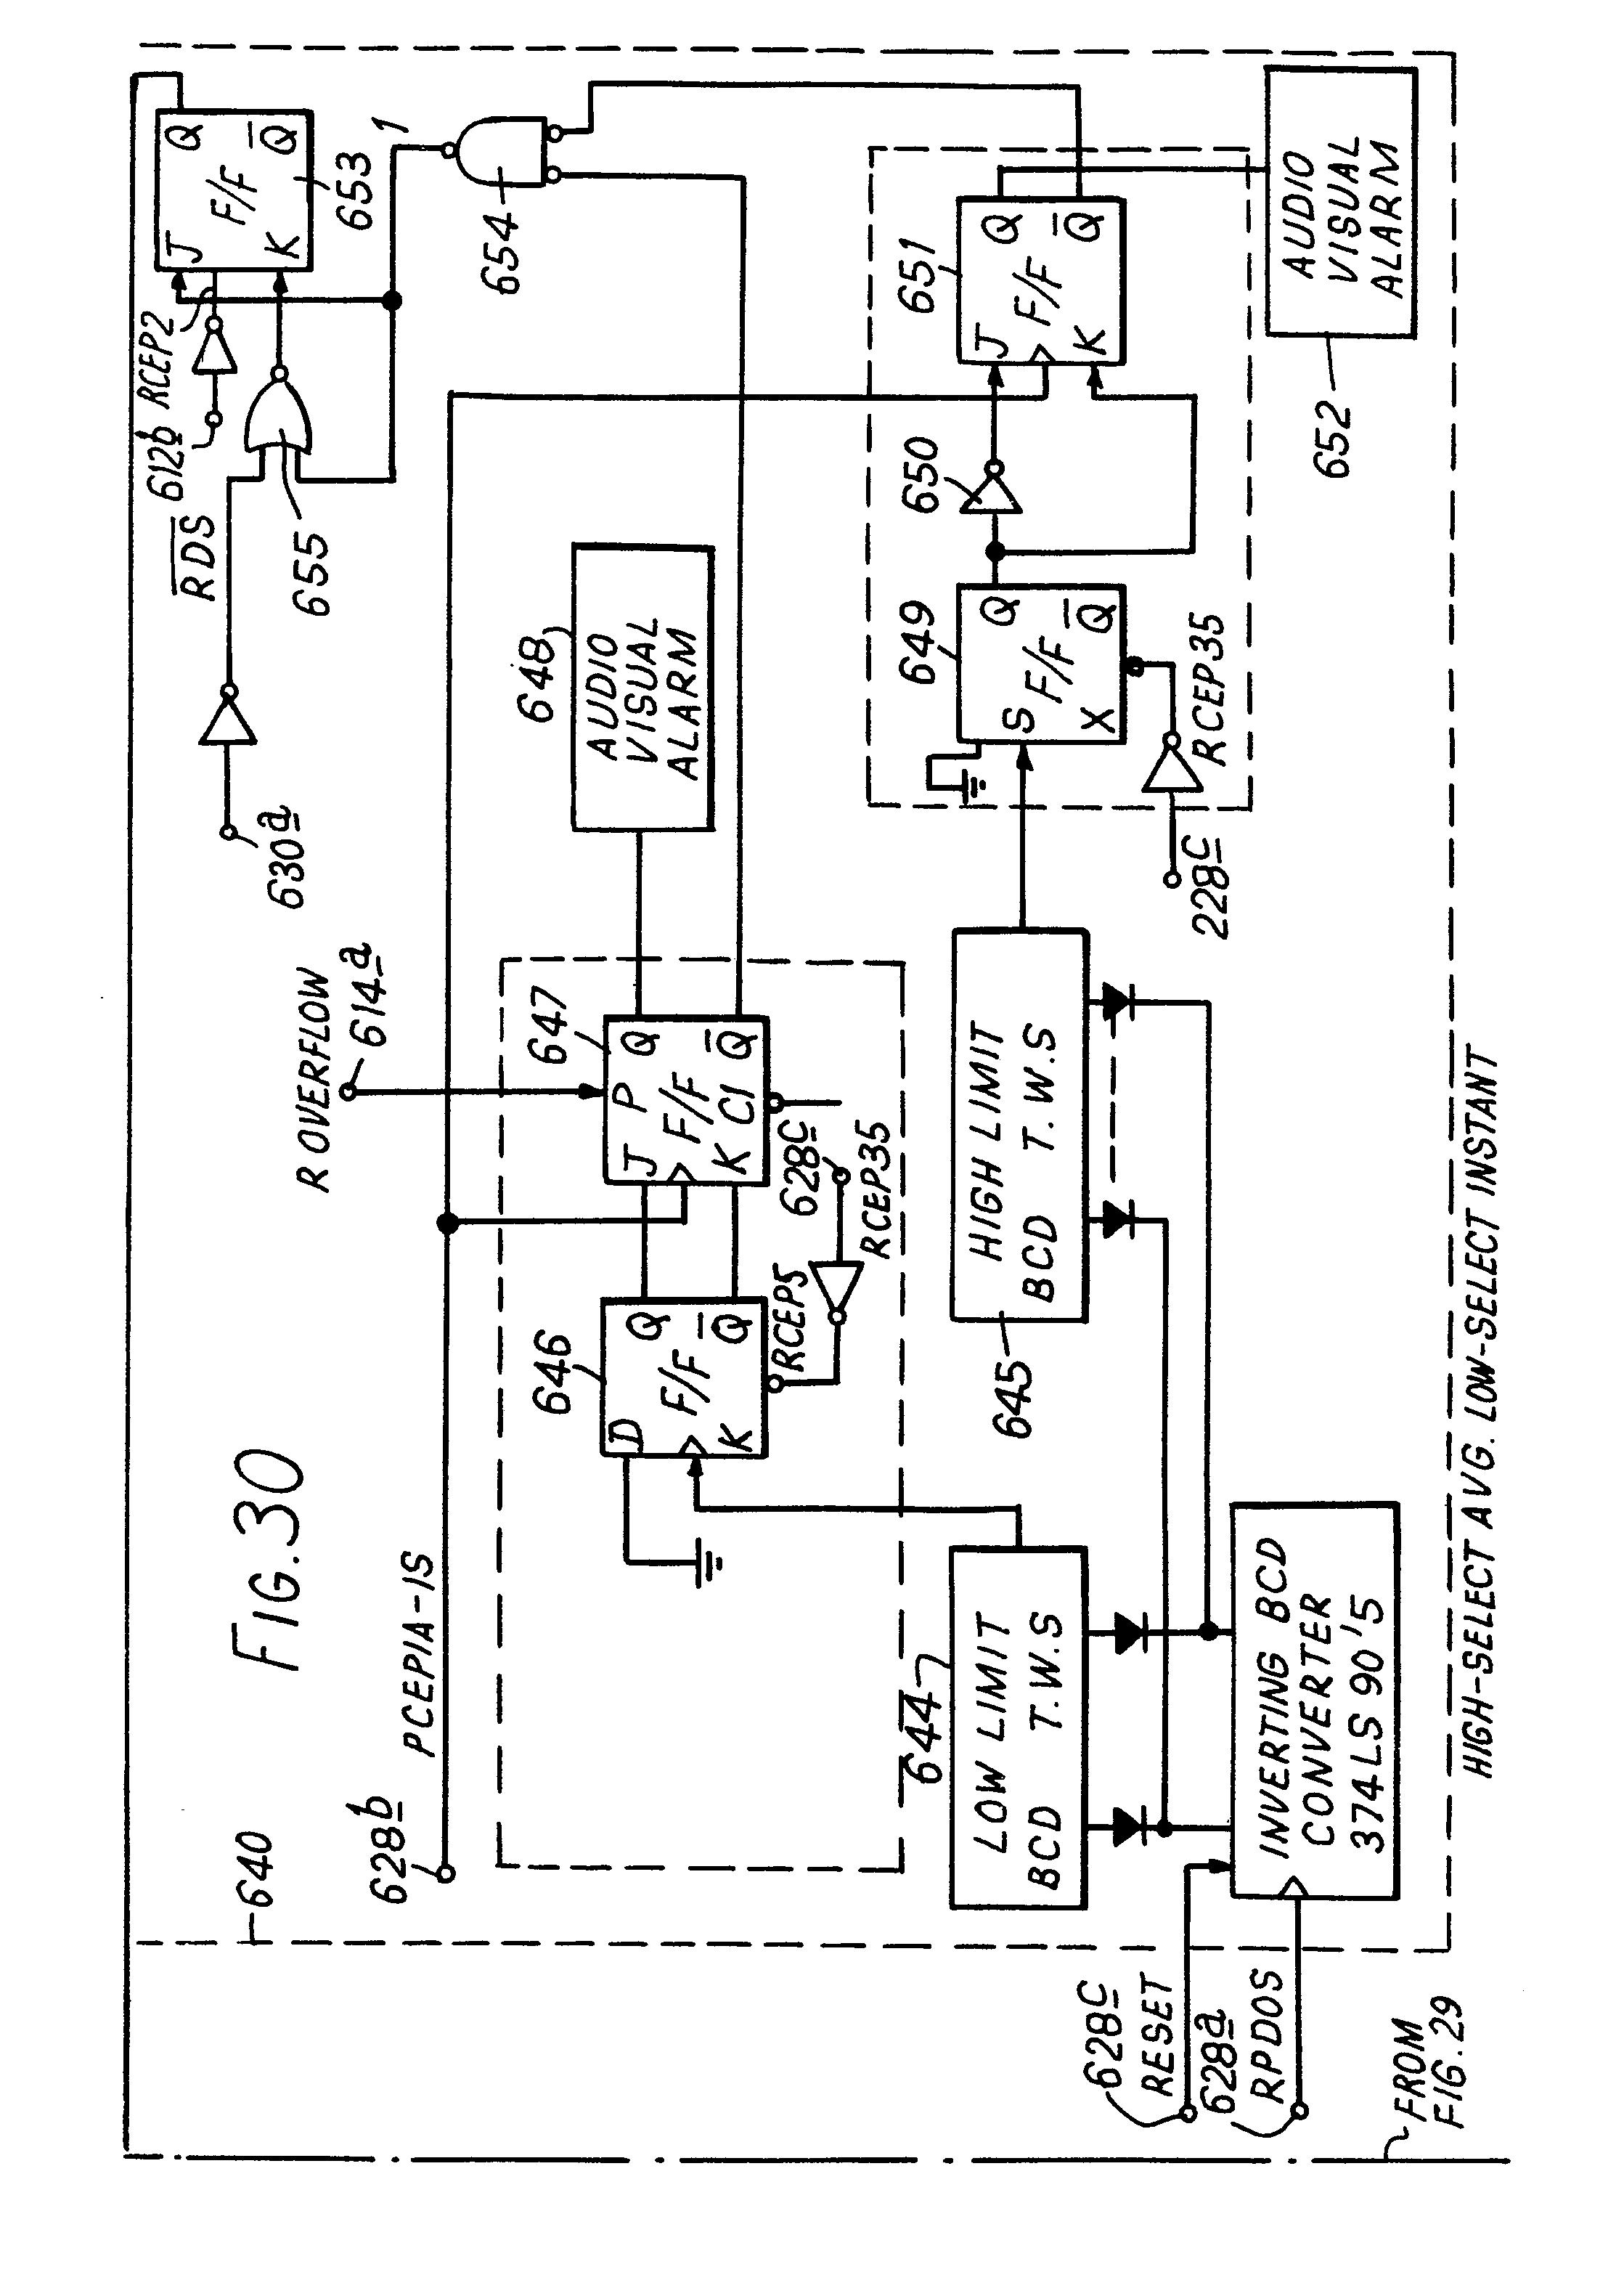 702 base mic wiring diagrams autowiring mx tl200 amp meter base diagram free download wiring diagrams pictures